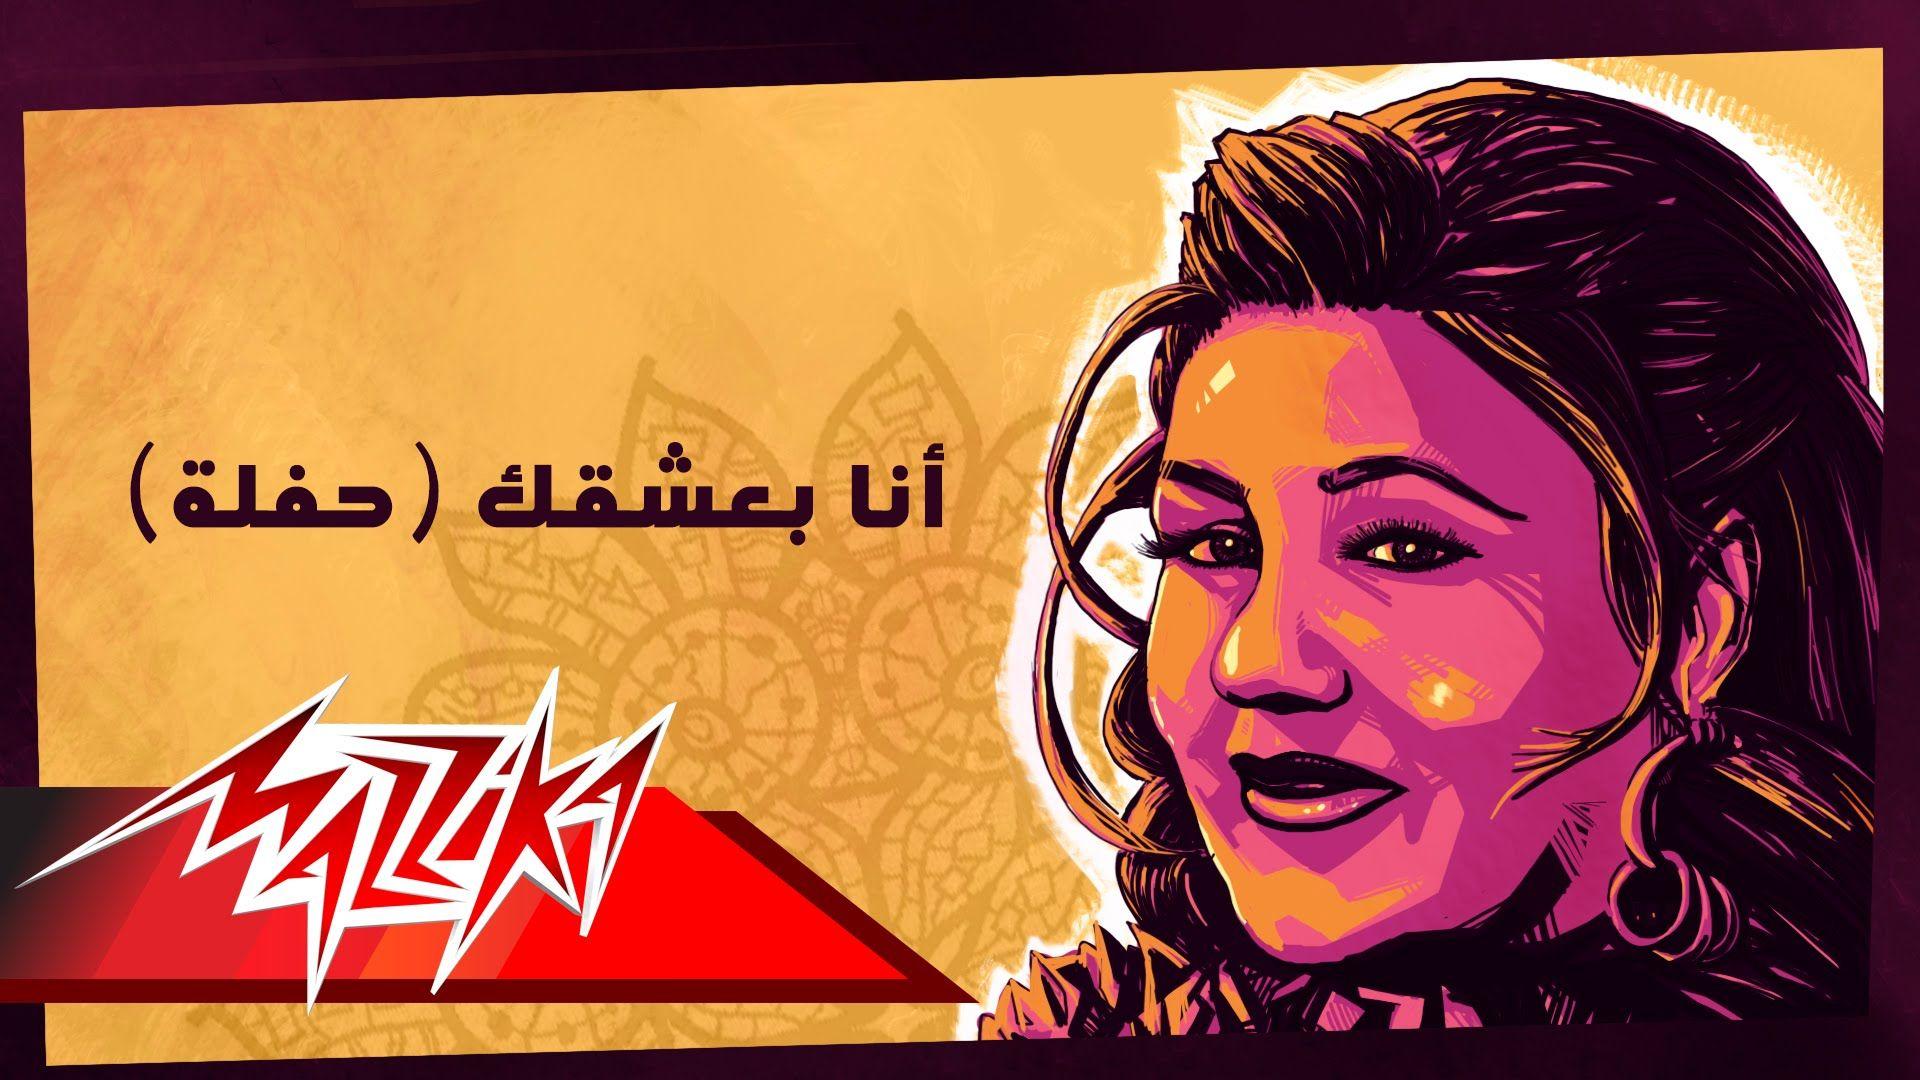 Ana Baashaak Mayada El Hennawy أنا بعشقك تسجيل حفلة ميادة الحناوي Comic Book Cover Comic Books Poster